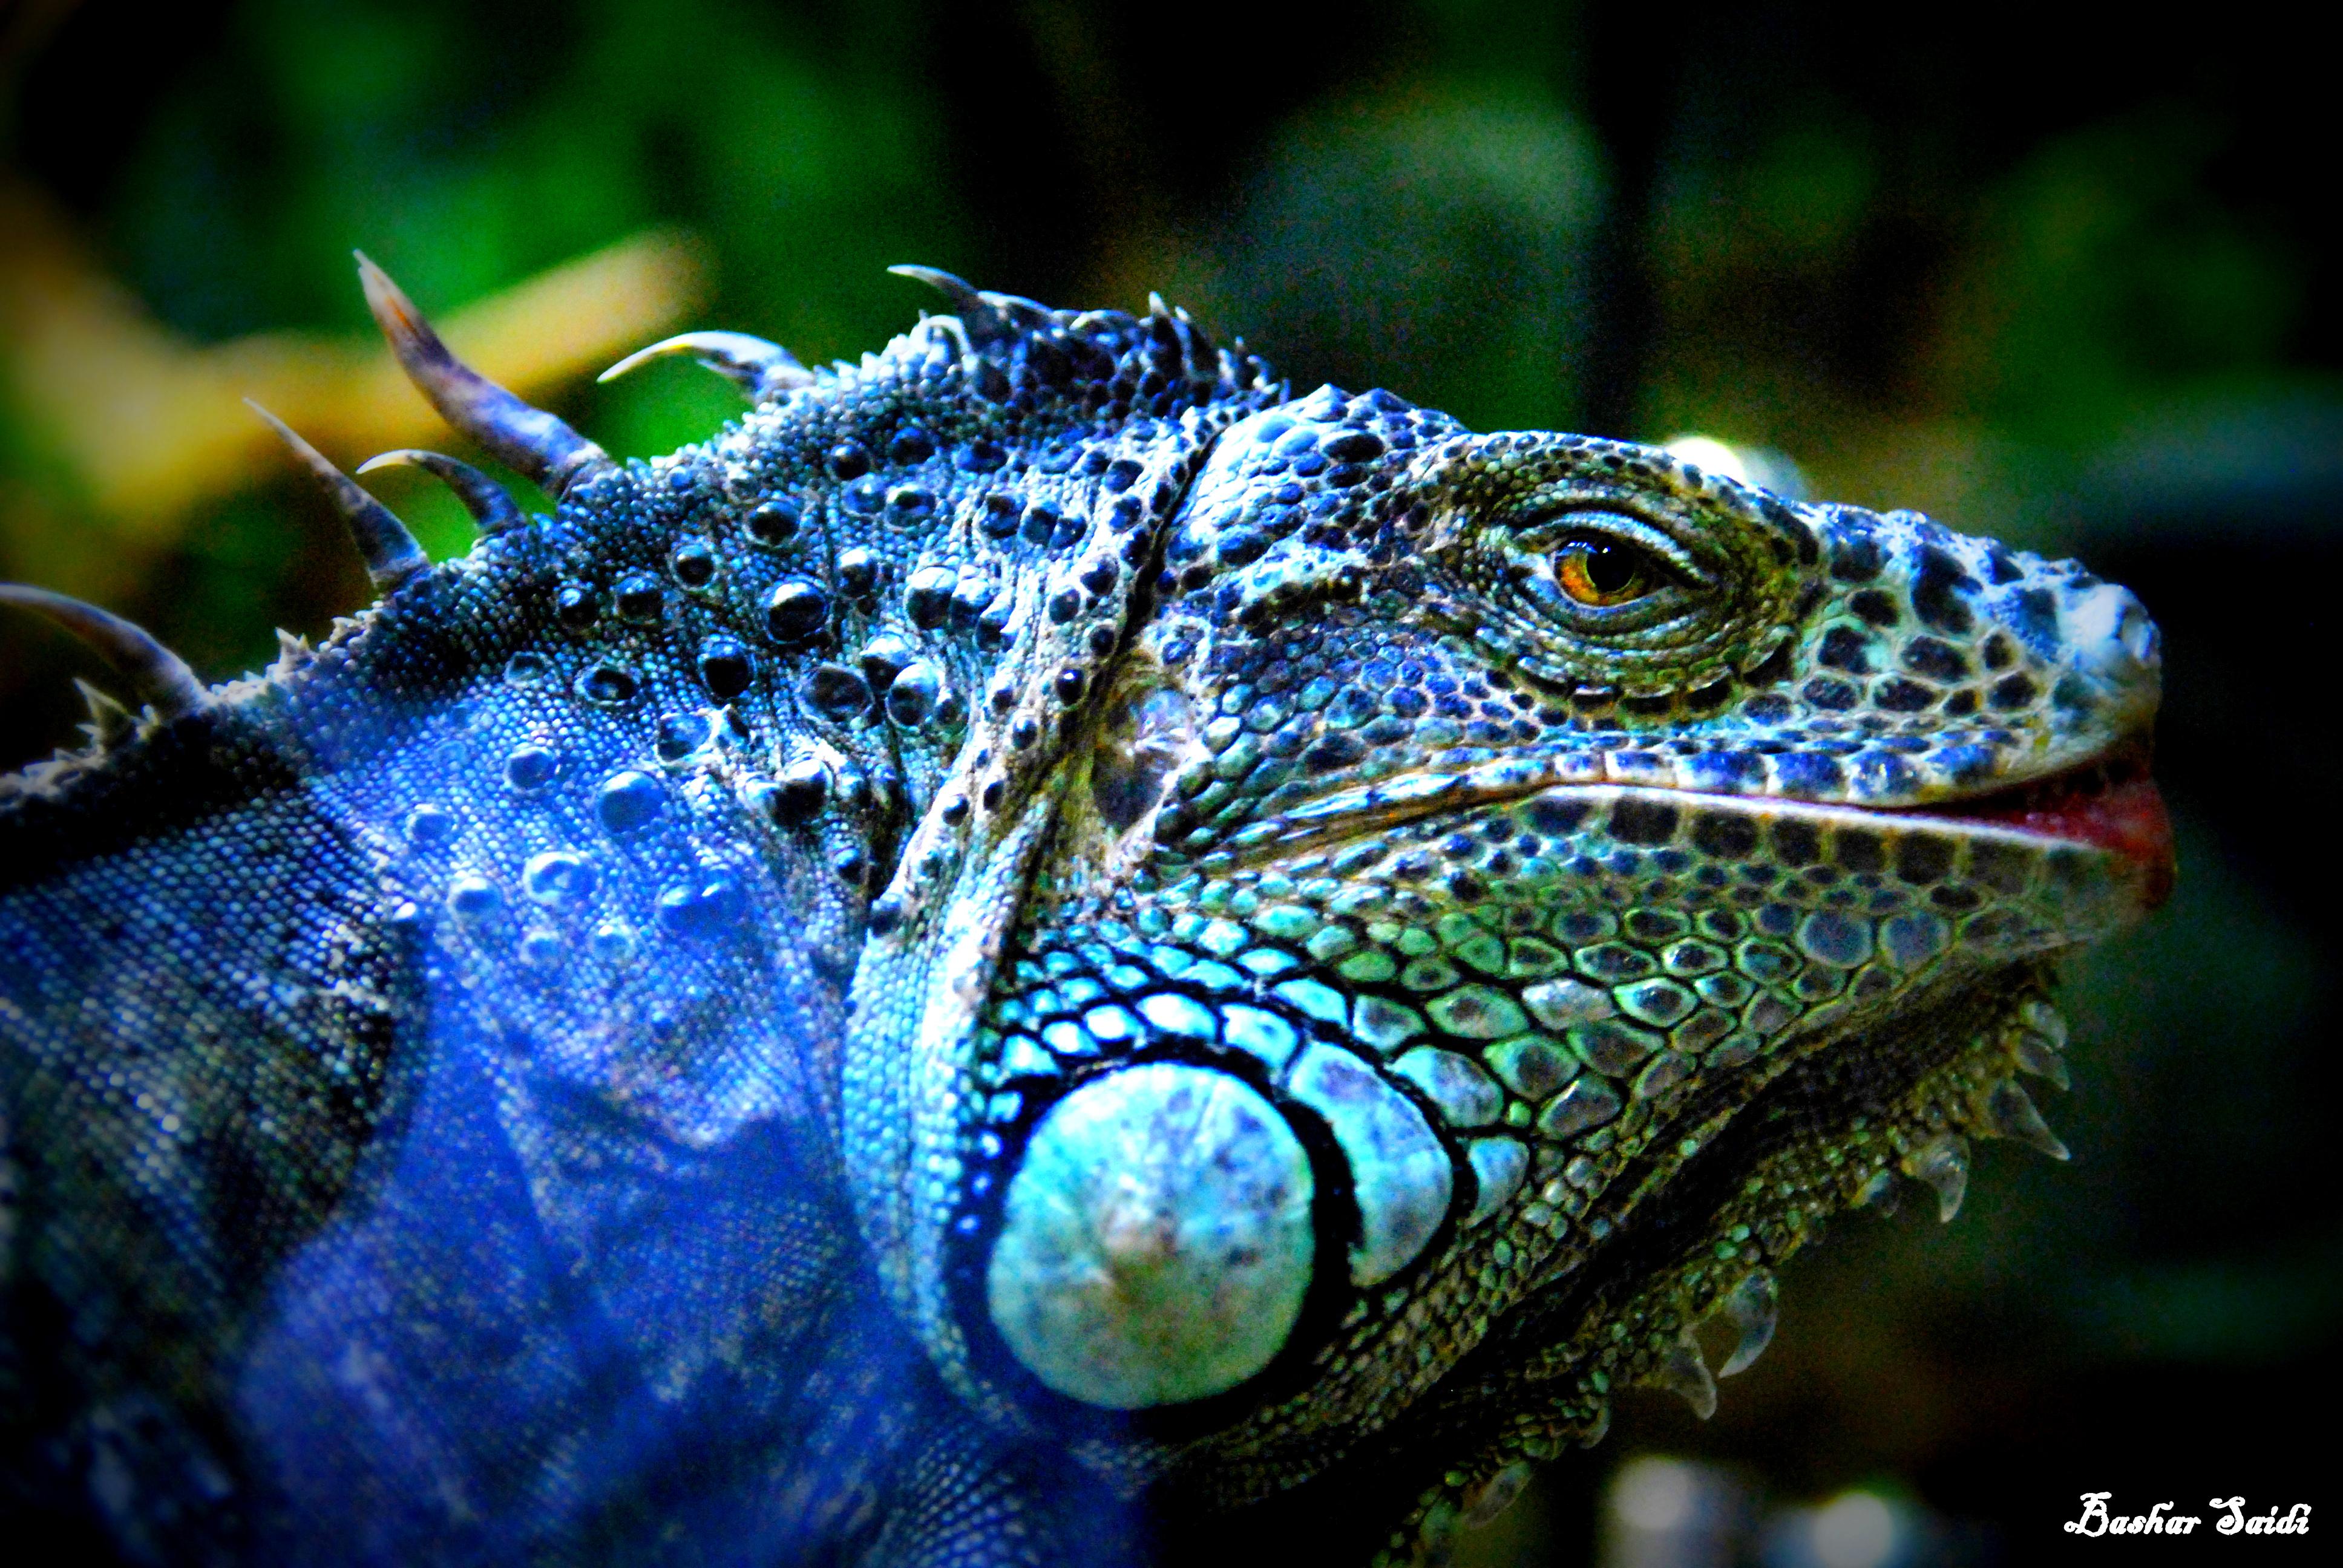 Iguana – Bashar Saidi